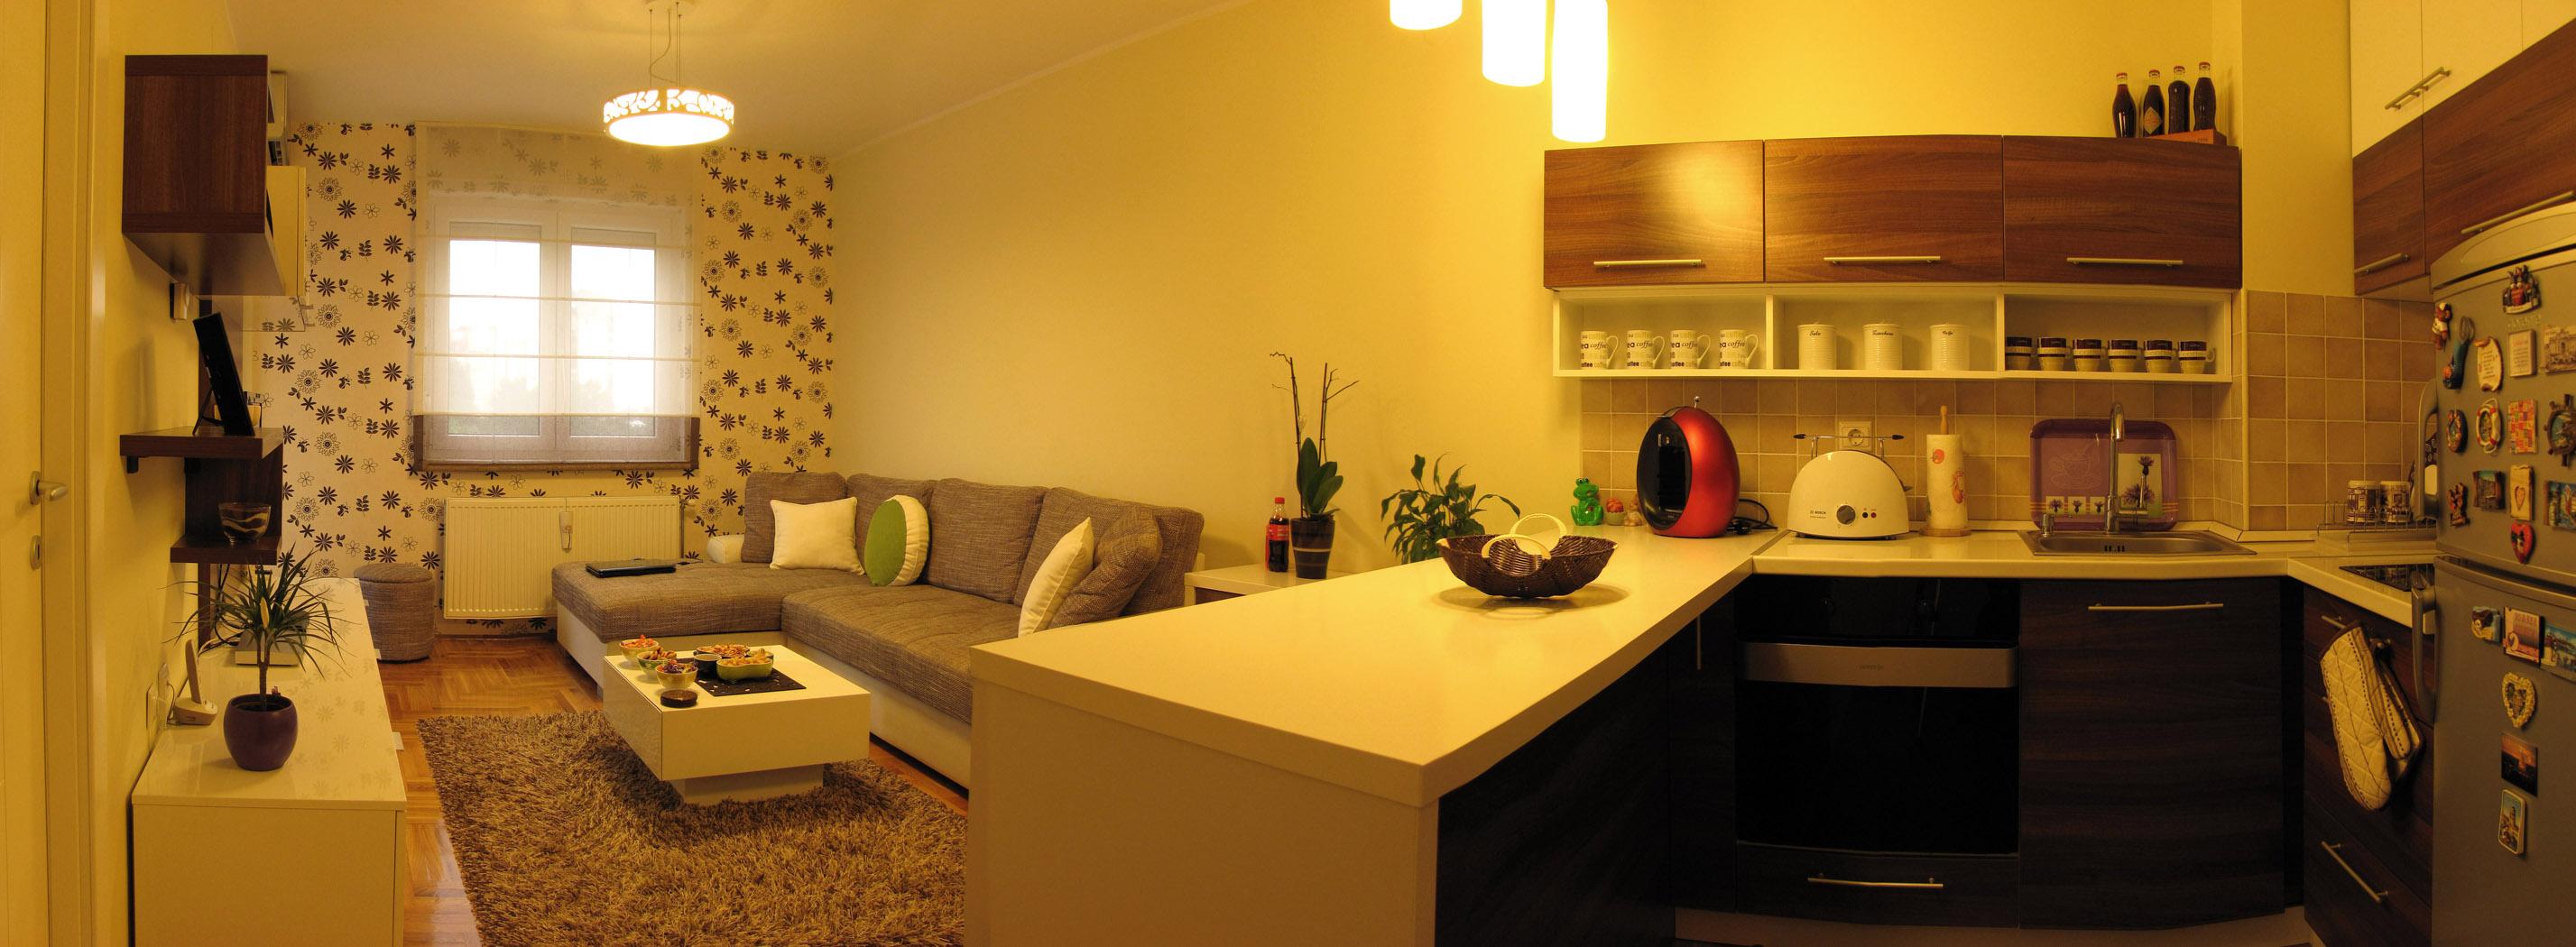 0027_LIVING ROOM